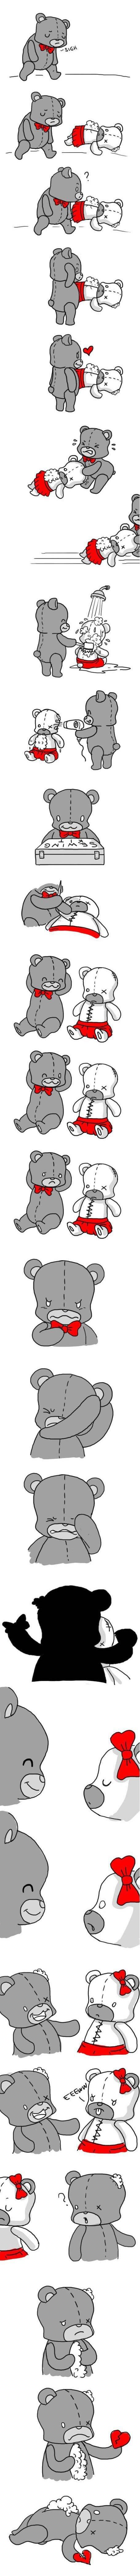 Teddy bear feels. Worth the read.. I completely misunderstood.